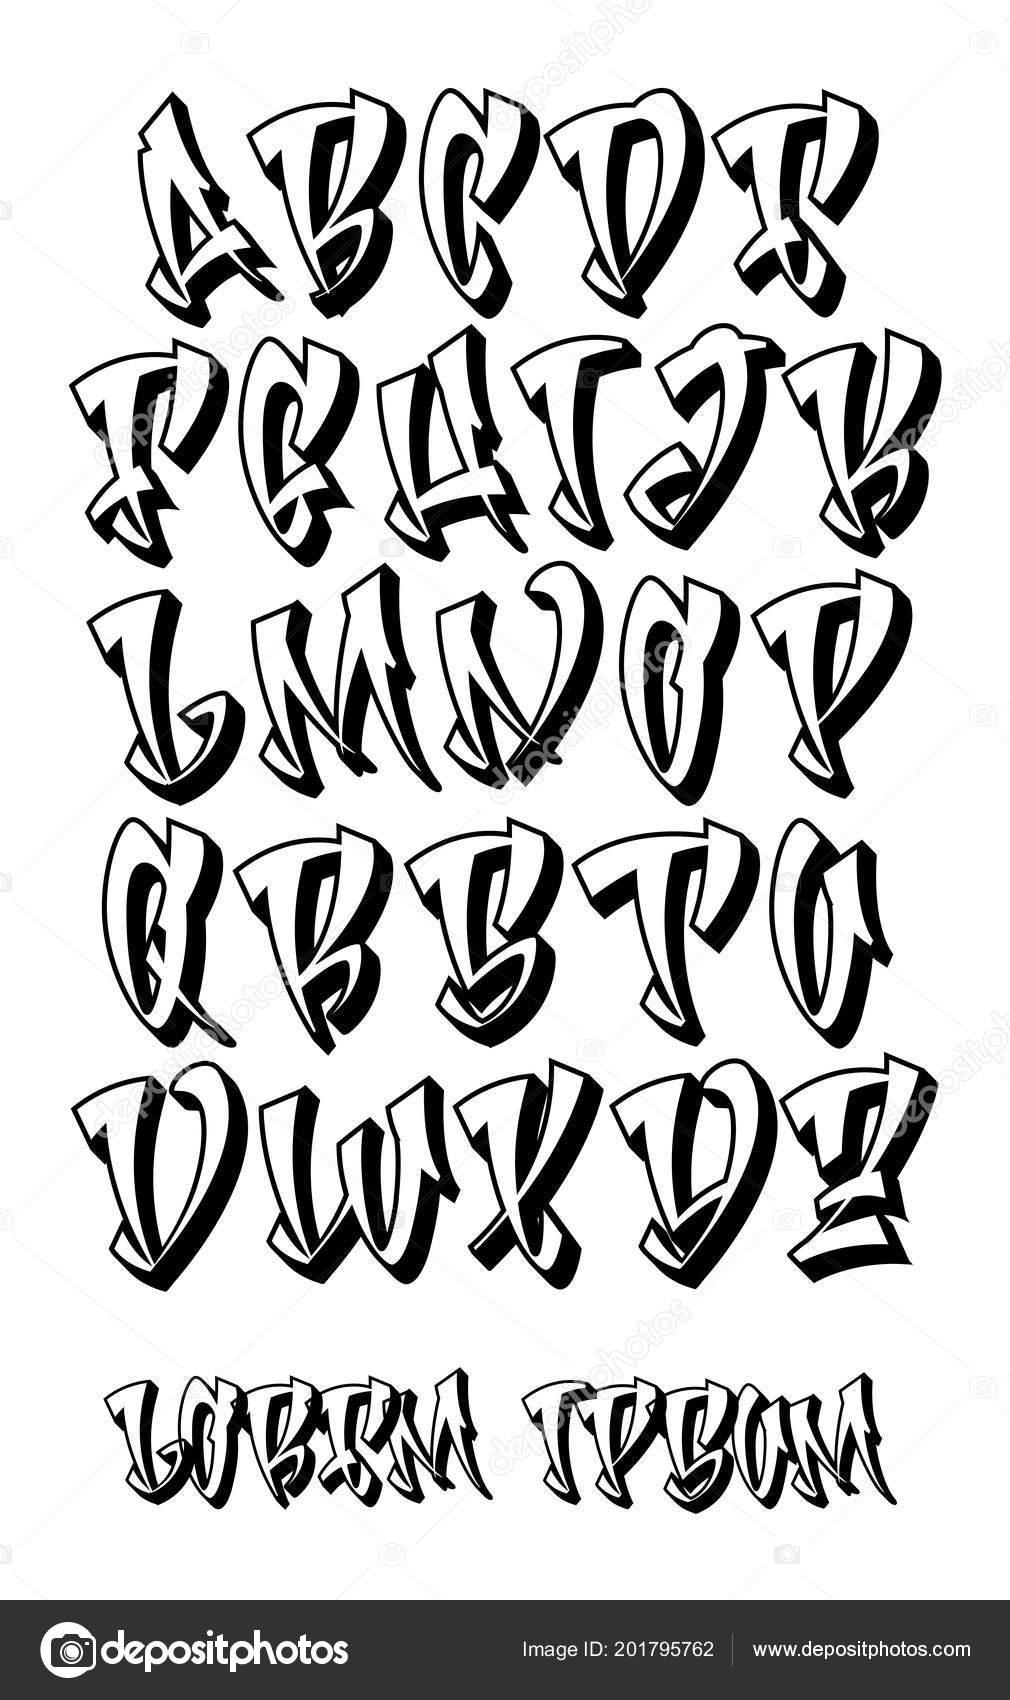 Vectorial font in graffiti hand written 3d style capital letters alphabet